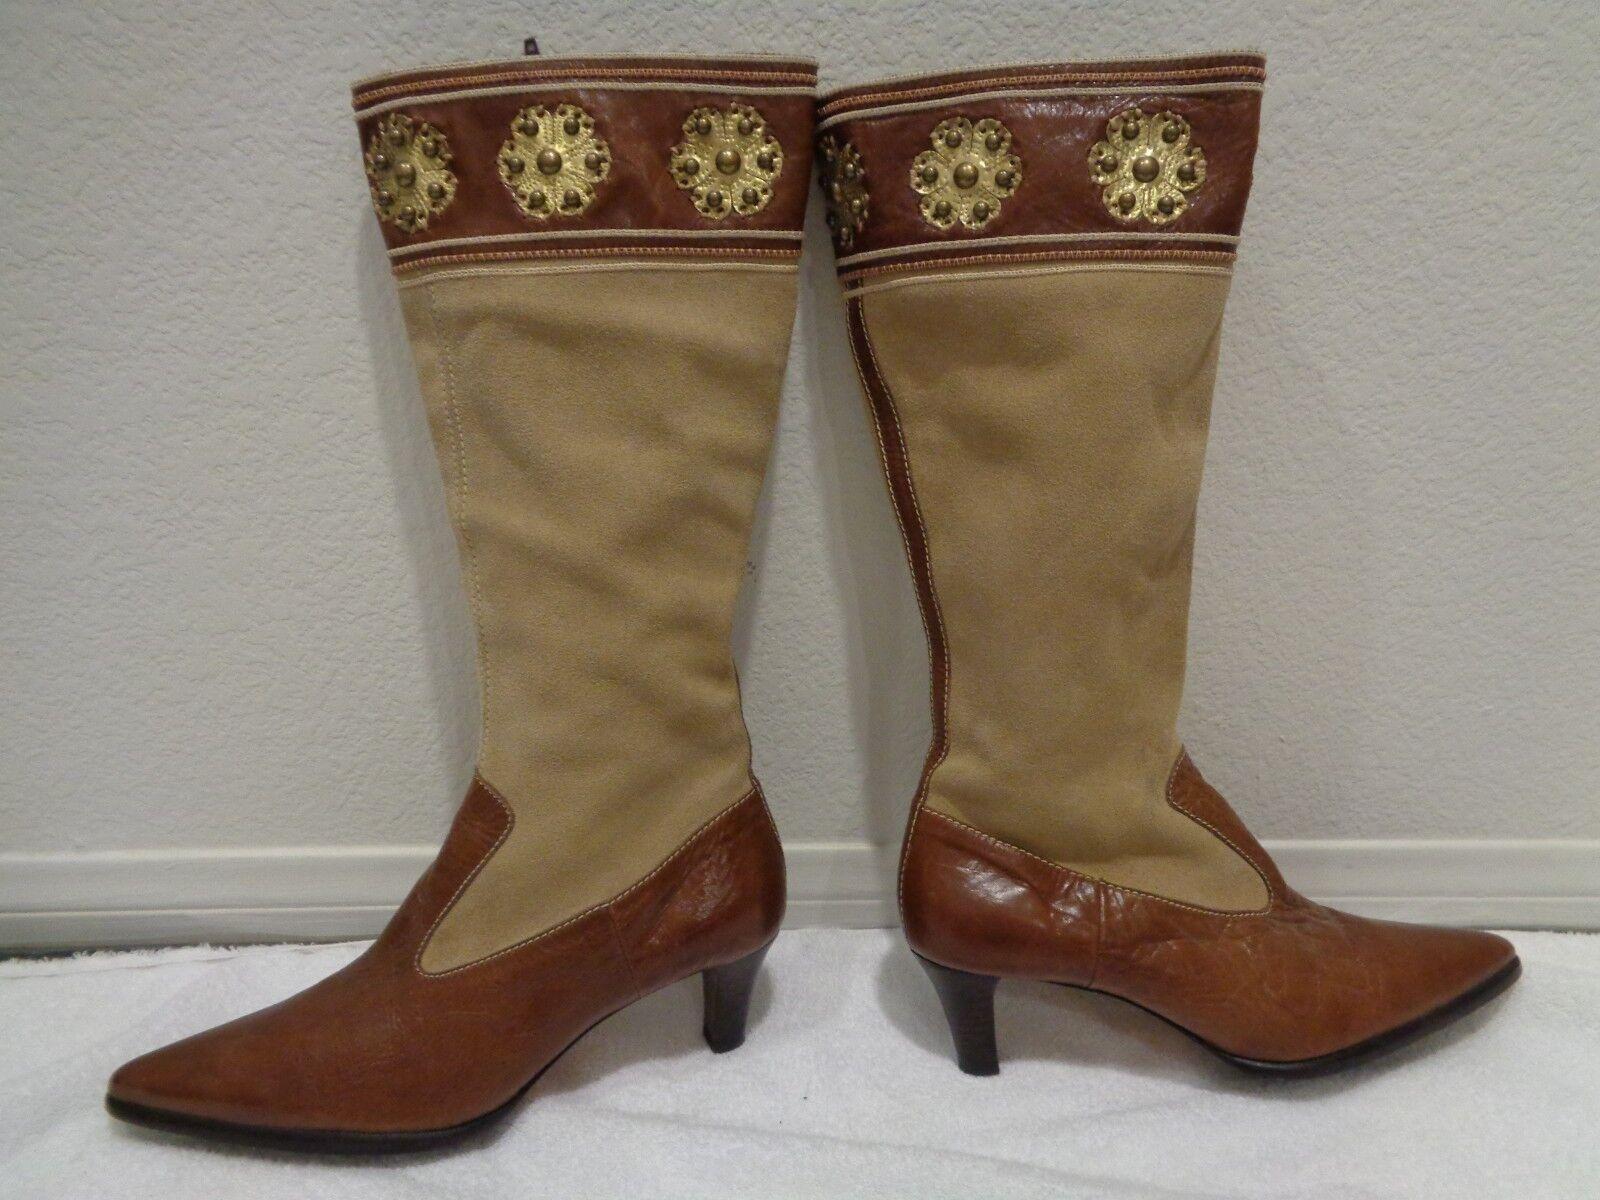 Mikala  MARIANNE  en cuir marron clair en daim western Équitation Équitation Pointure 9